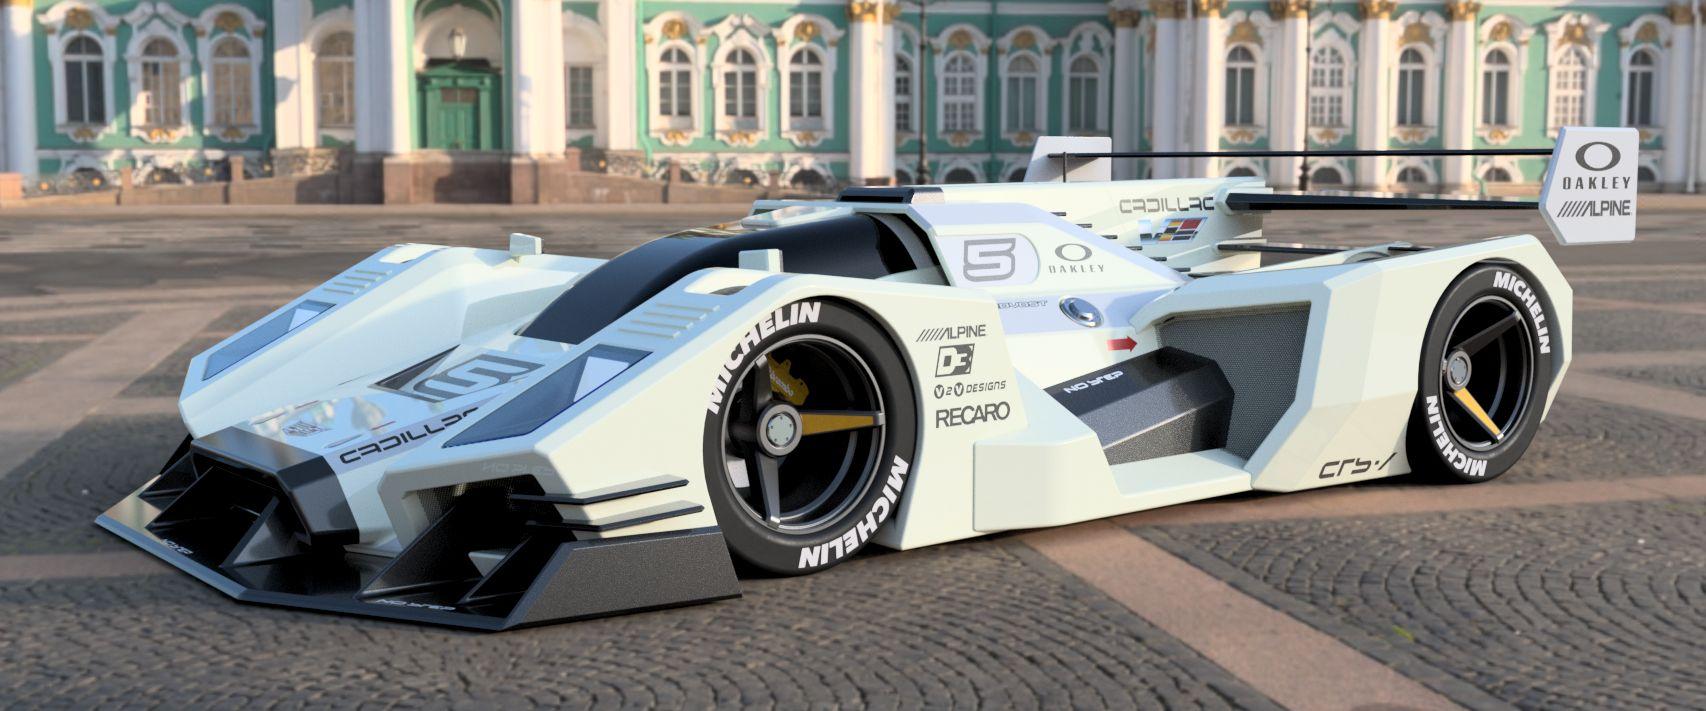 Formula-1-3500-3500